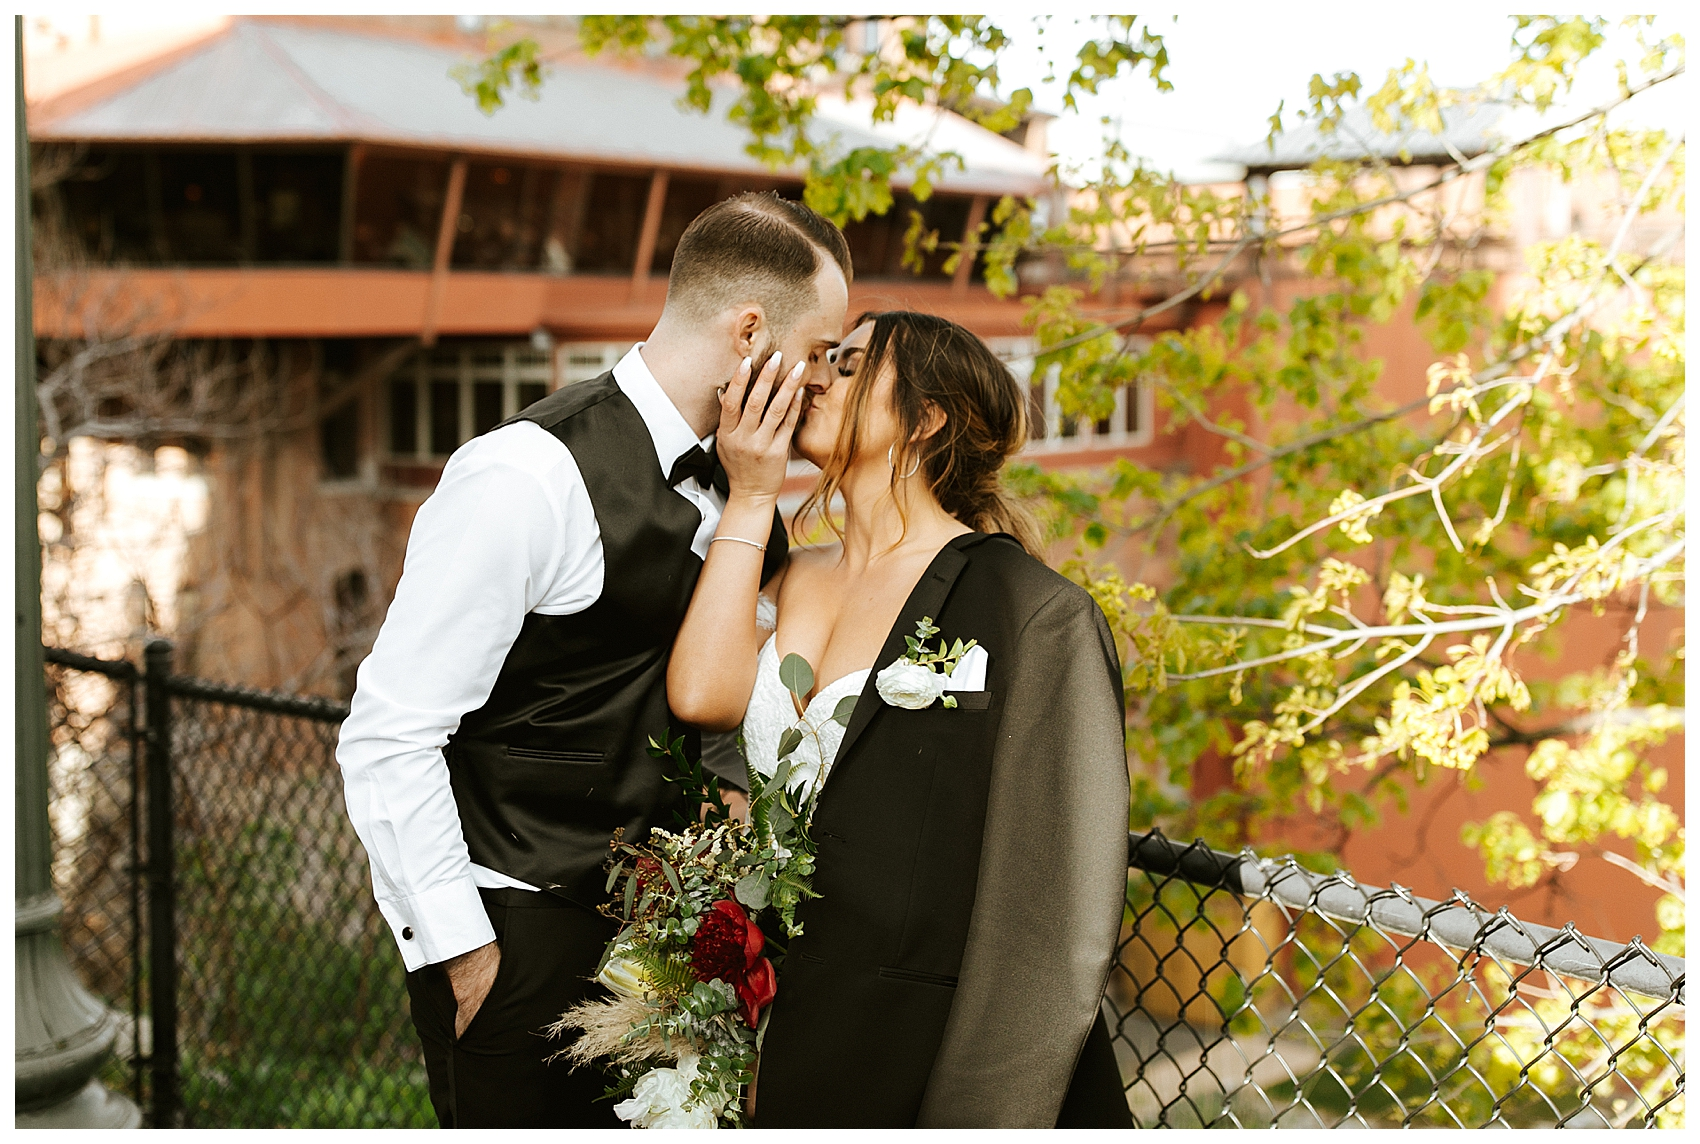 Chateau Rive Spokane Wedding Cassie Trottier Photography01087.jpg